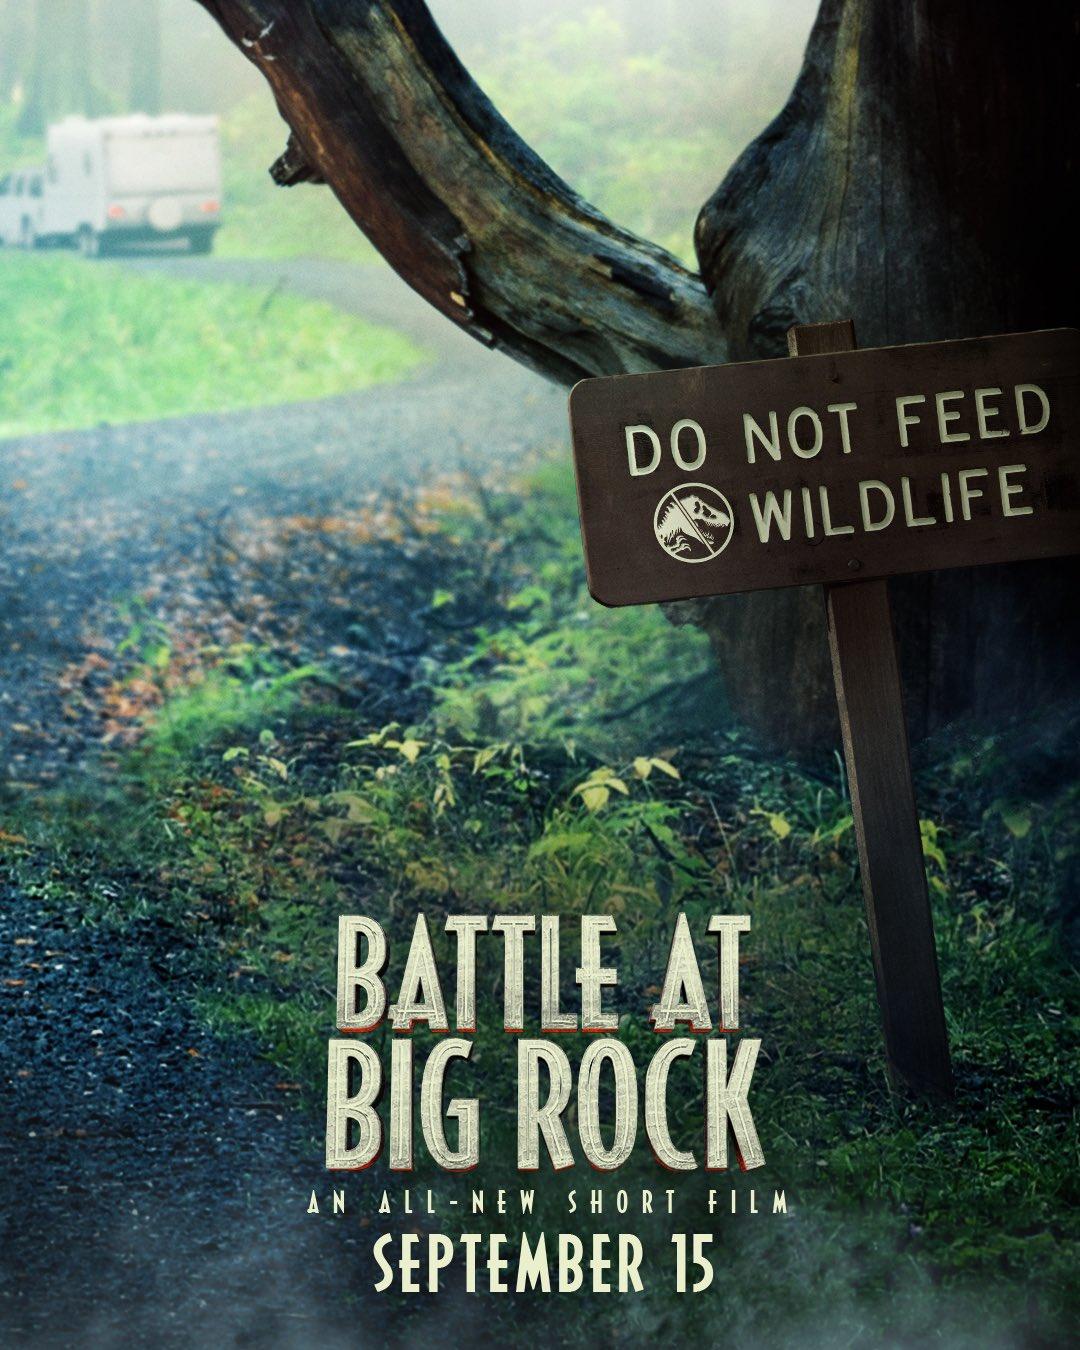 Battle-at-Big-Rock-poster.jpg